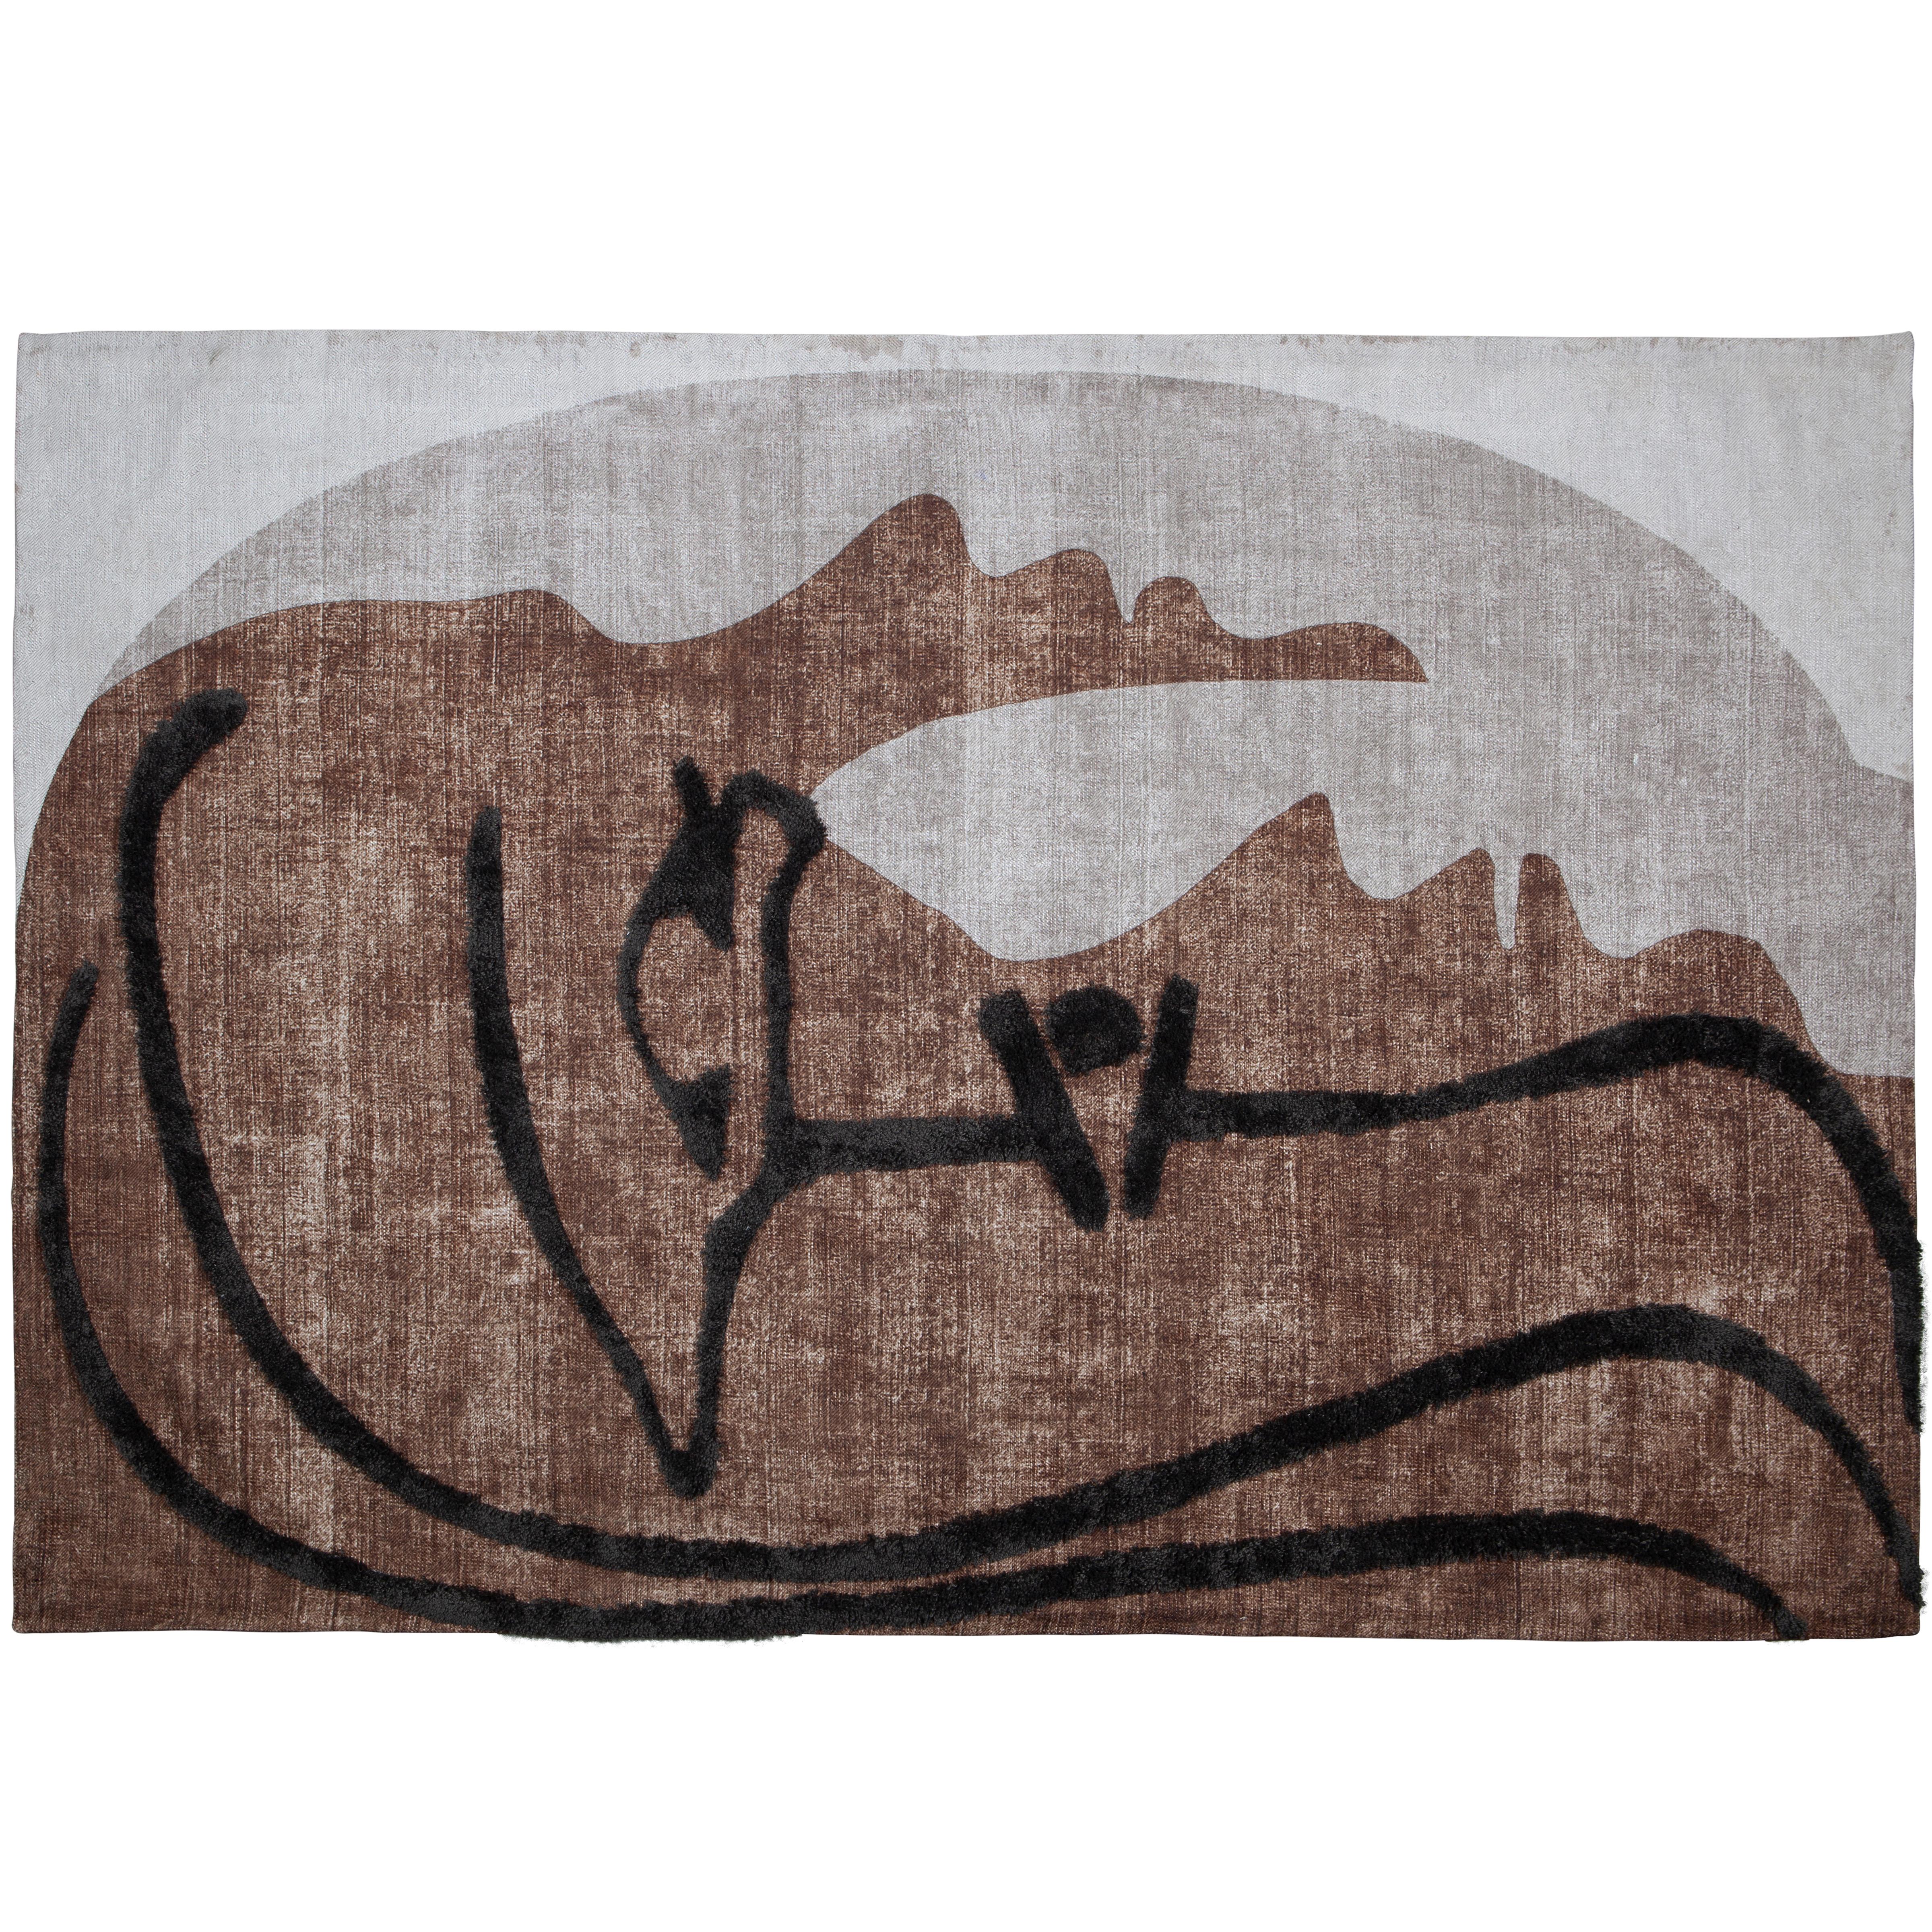 Tapis motif abstrait marron 170x240 cm